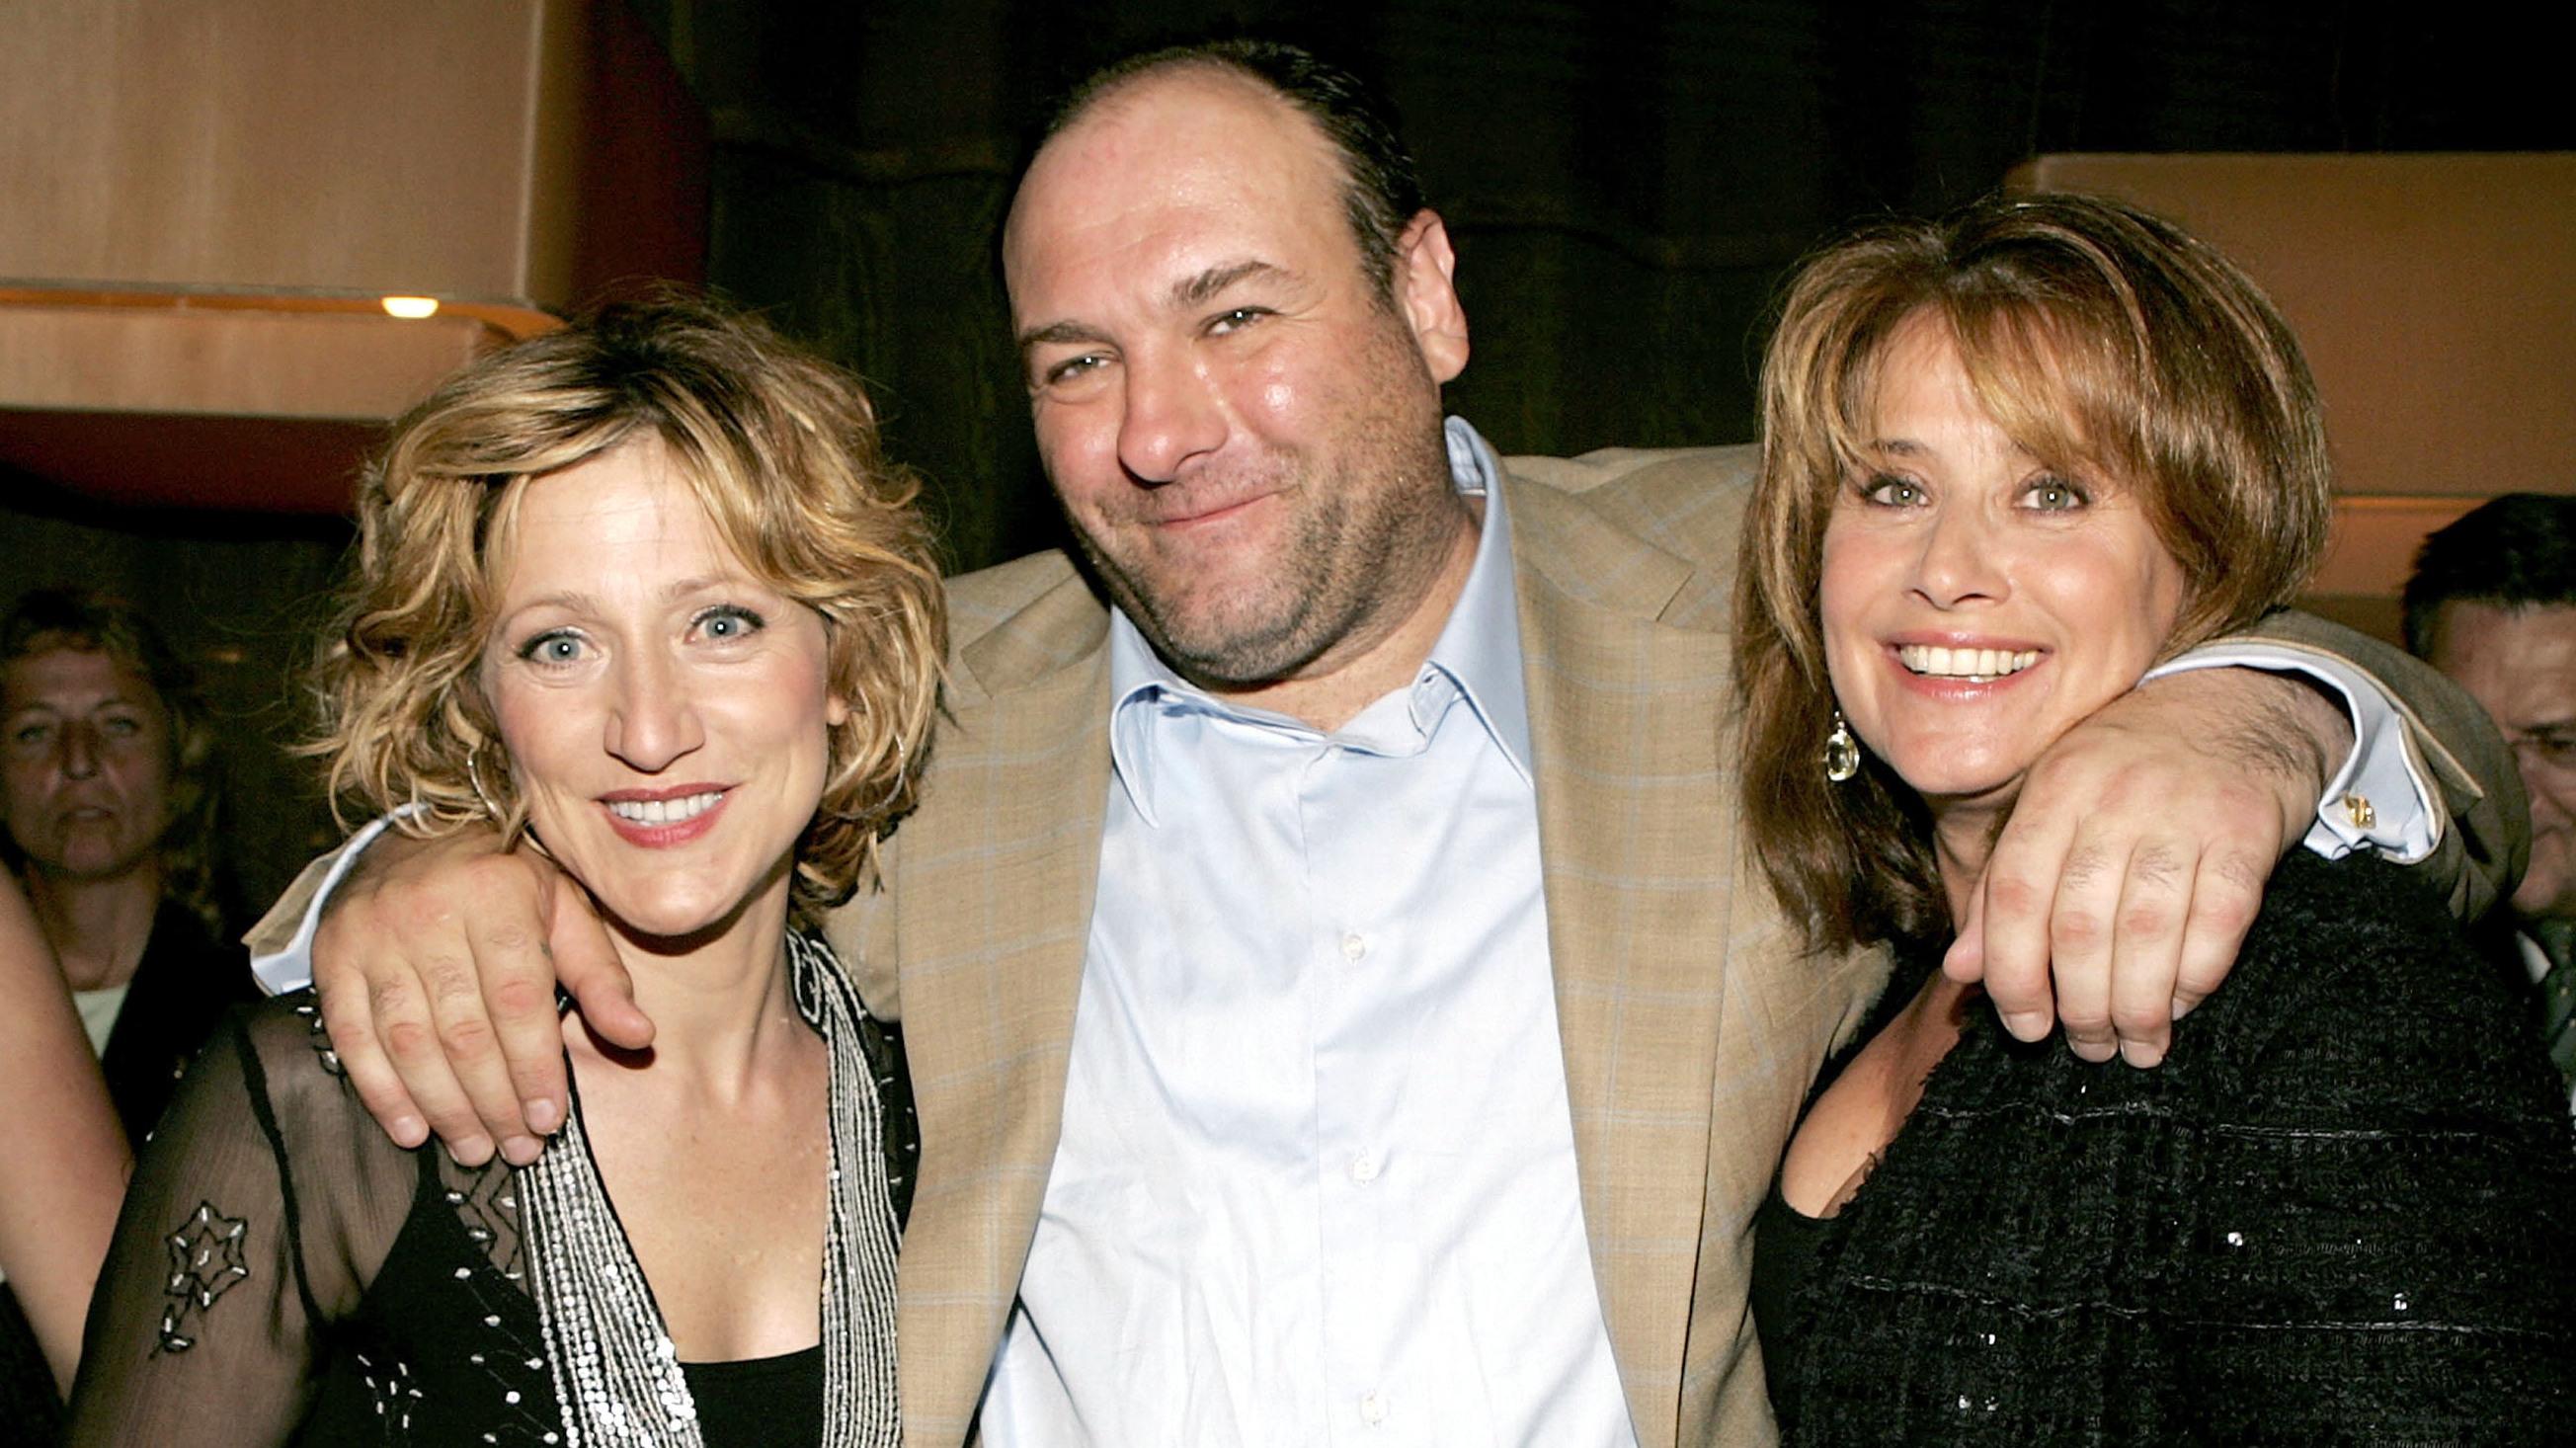 James Gandolfini Dies; 'Sopranos' Actor Was 51